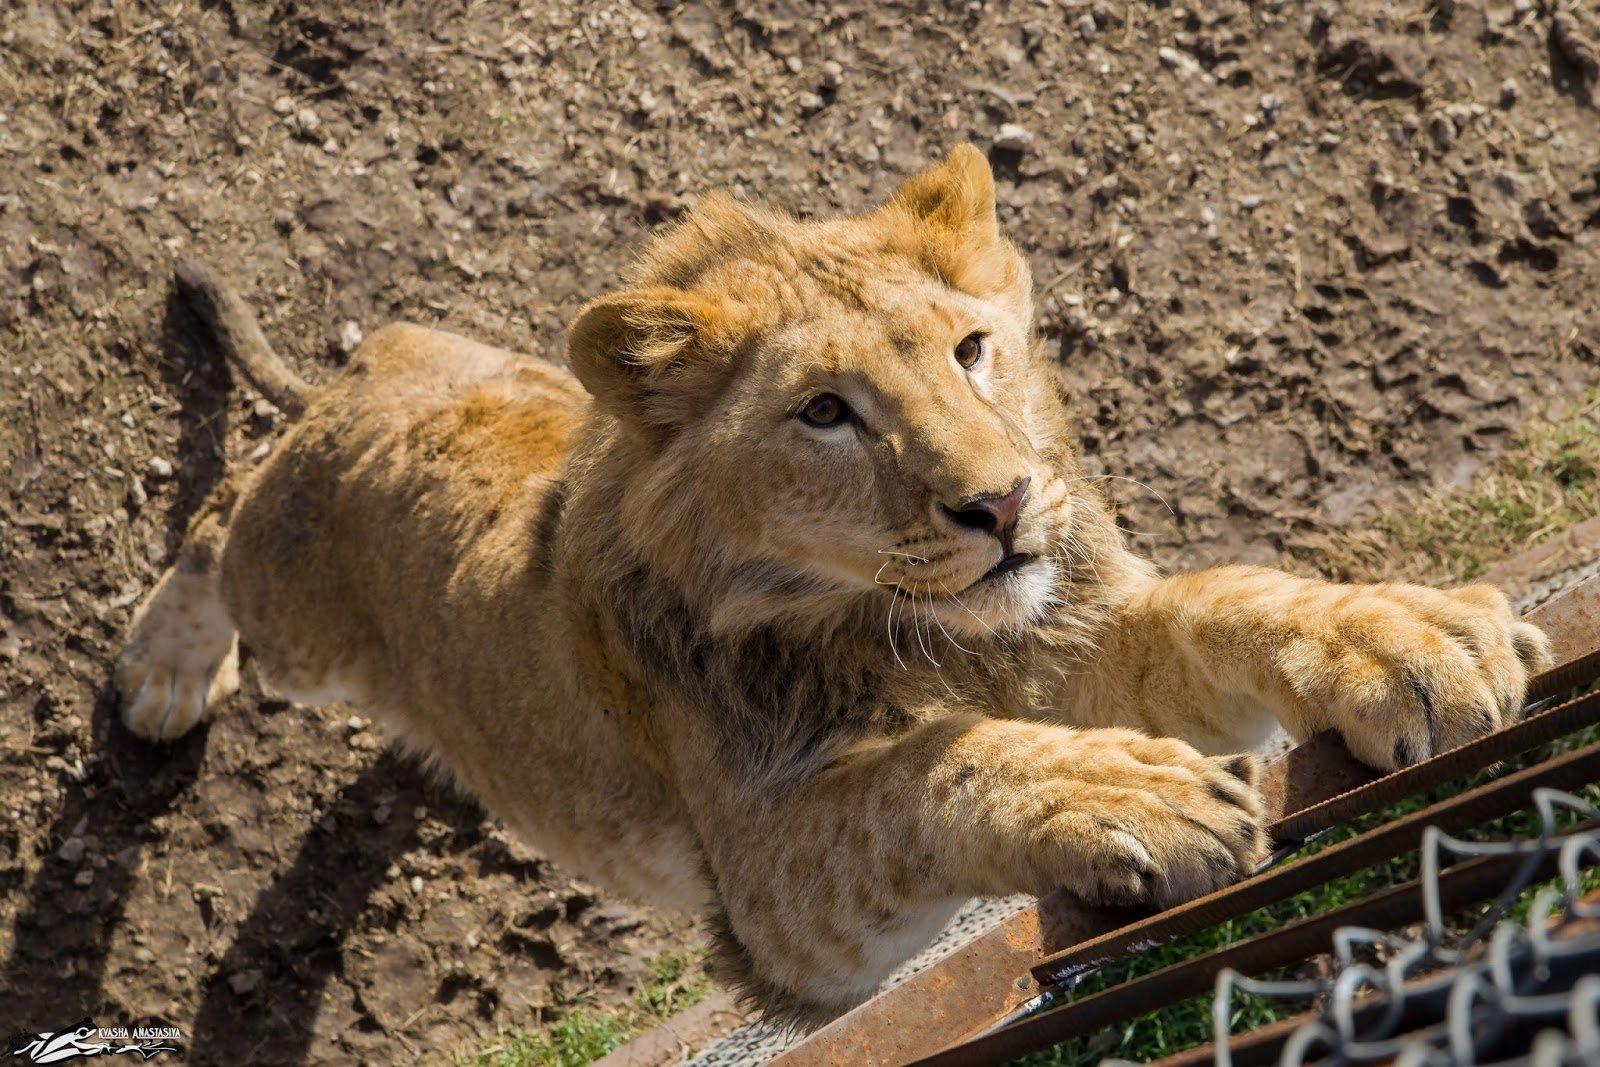 В Пномпене лев сбежал от хозяина и разгуливал по улицам города